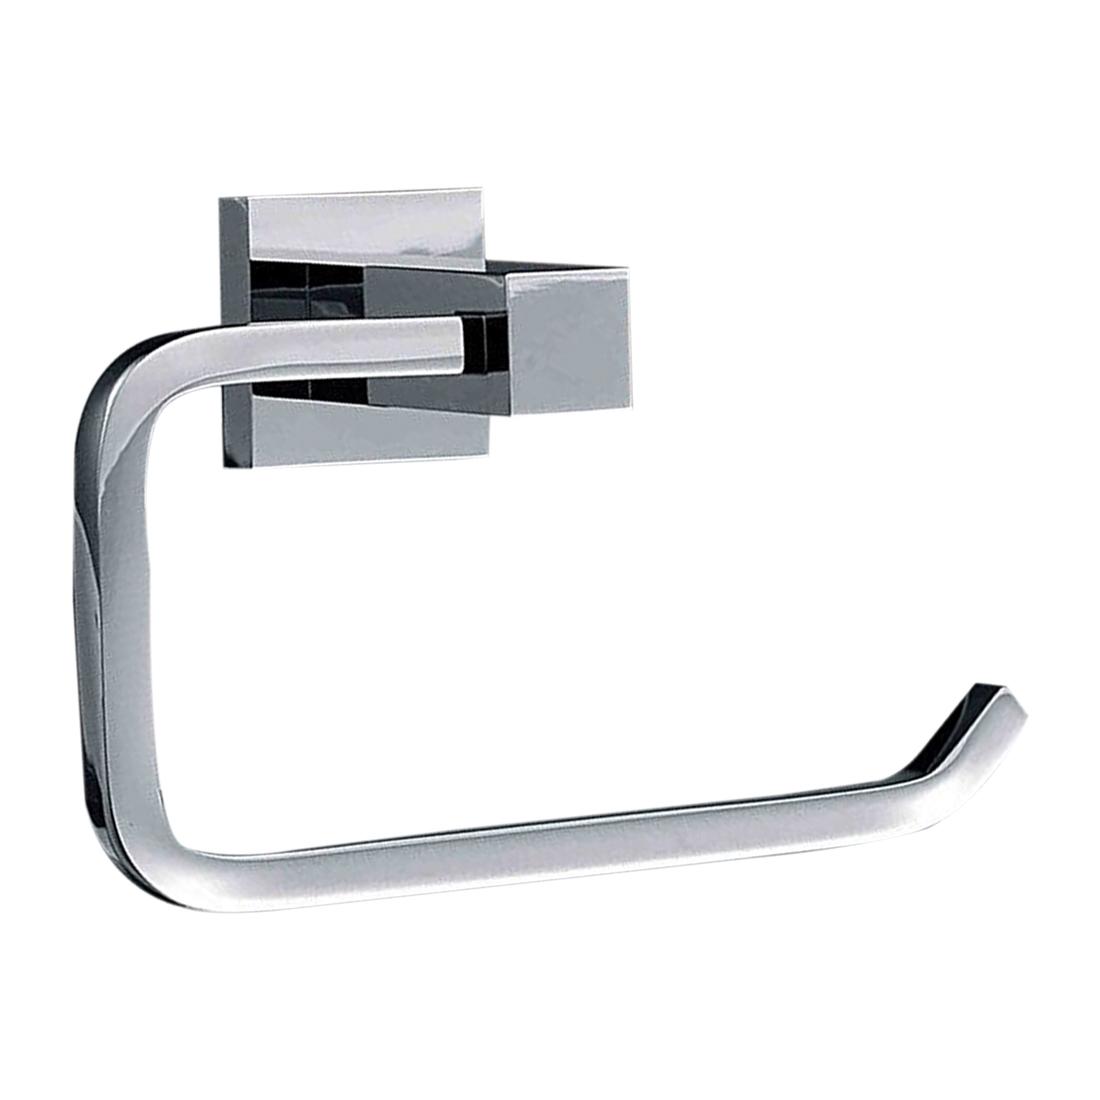 messing wandhalter toilettenpapierhalter papierhalter edelstahl de ebay. Black Bedroom Furniture Sets. Home Design Ideas